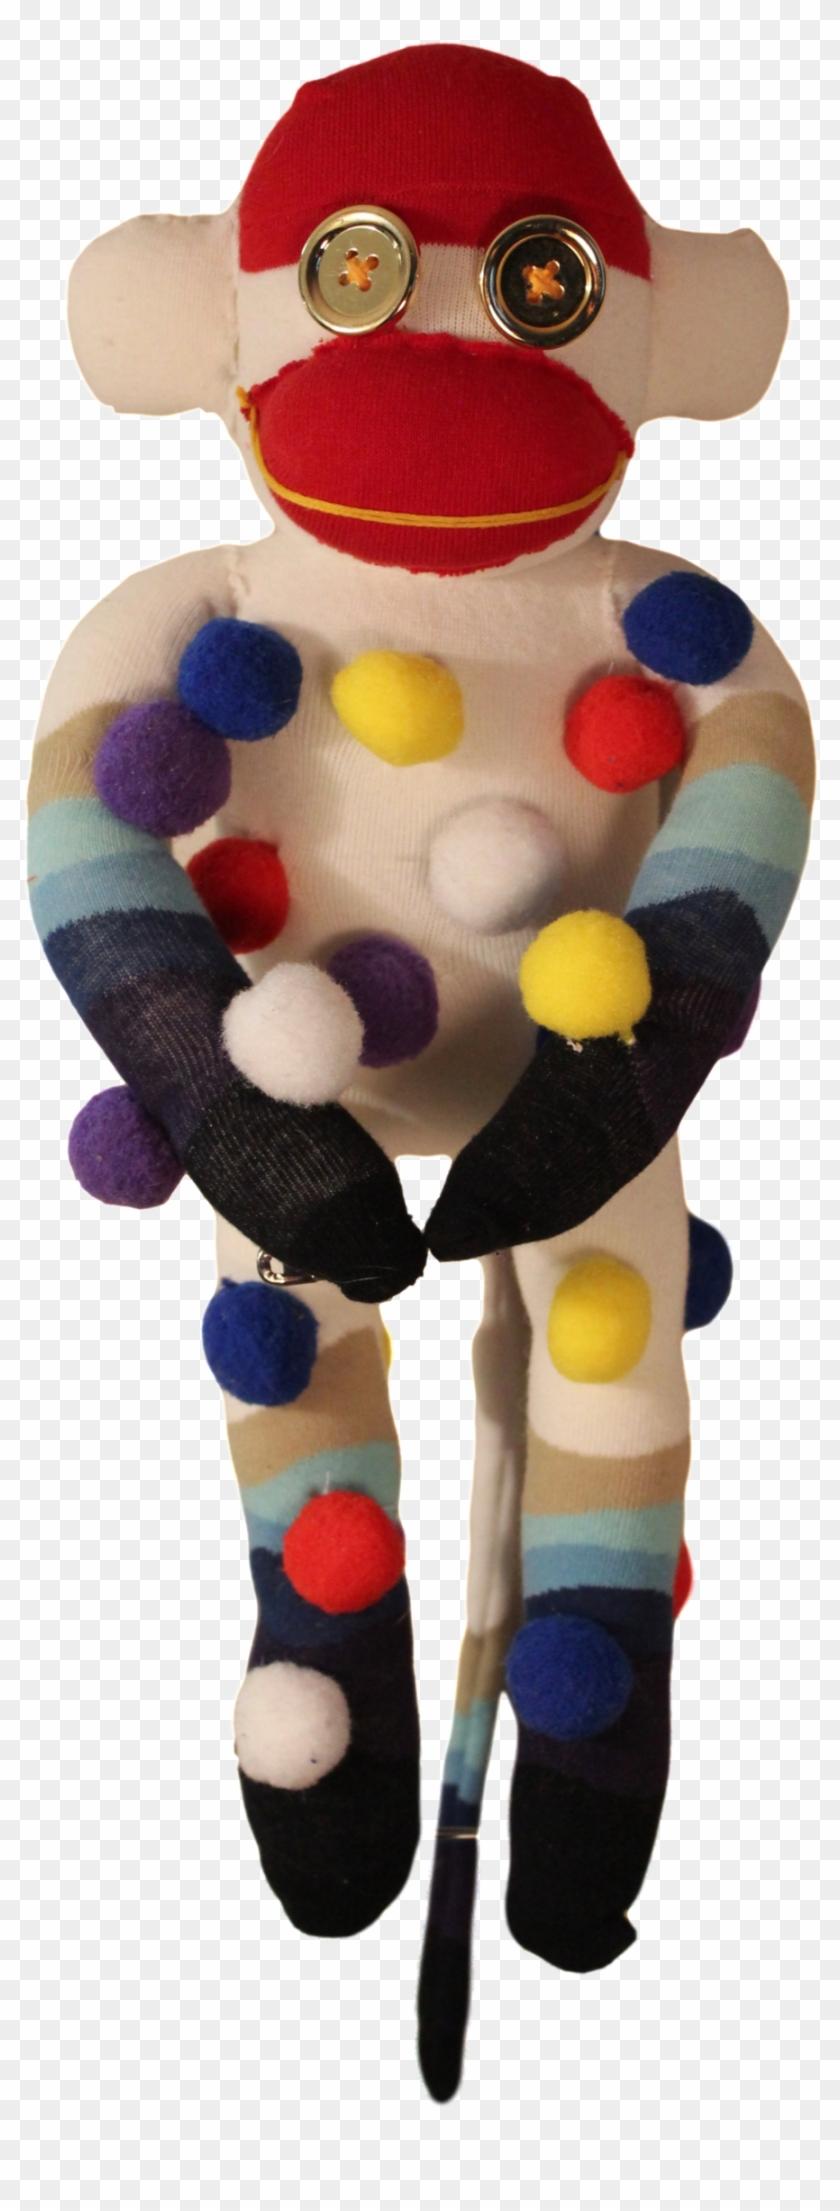 Handmade Sock Monkey Plush Toy With Funky Pattern Socks - Sock Monkey #291494